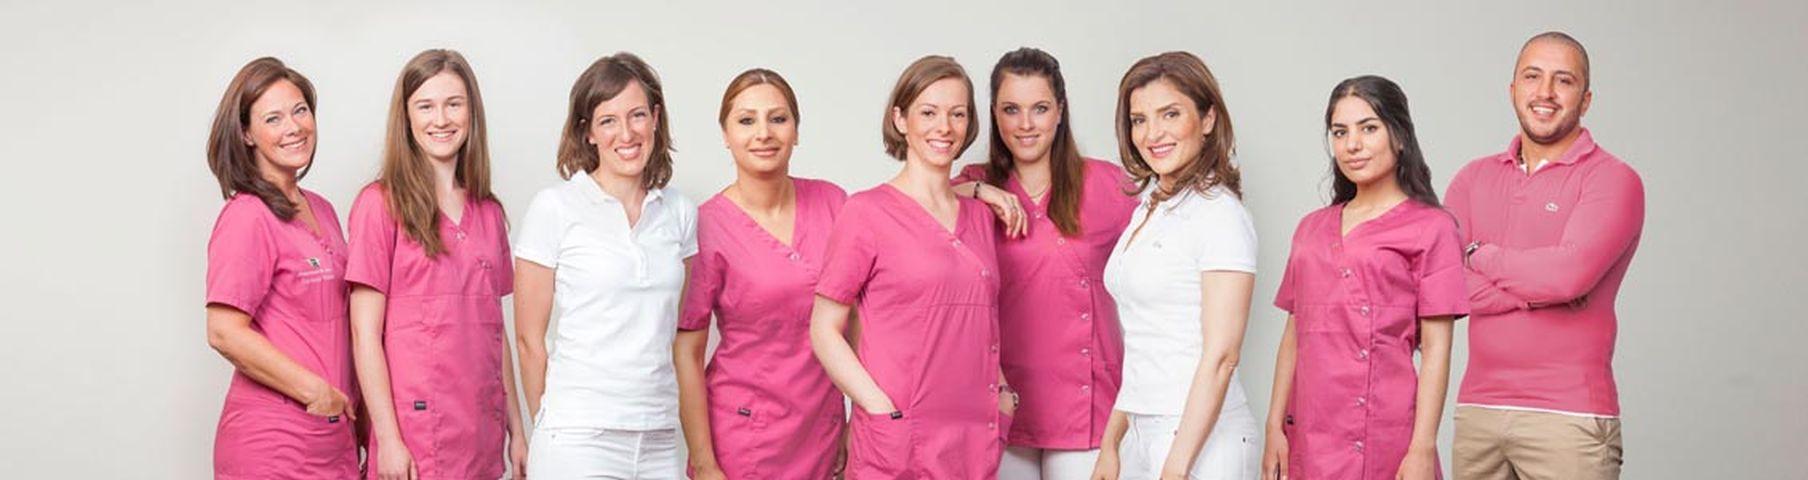 Kieferorthopädische Praxis Dr. med. dent. Semira Assim